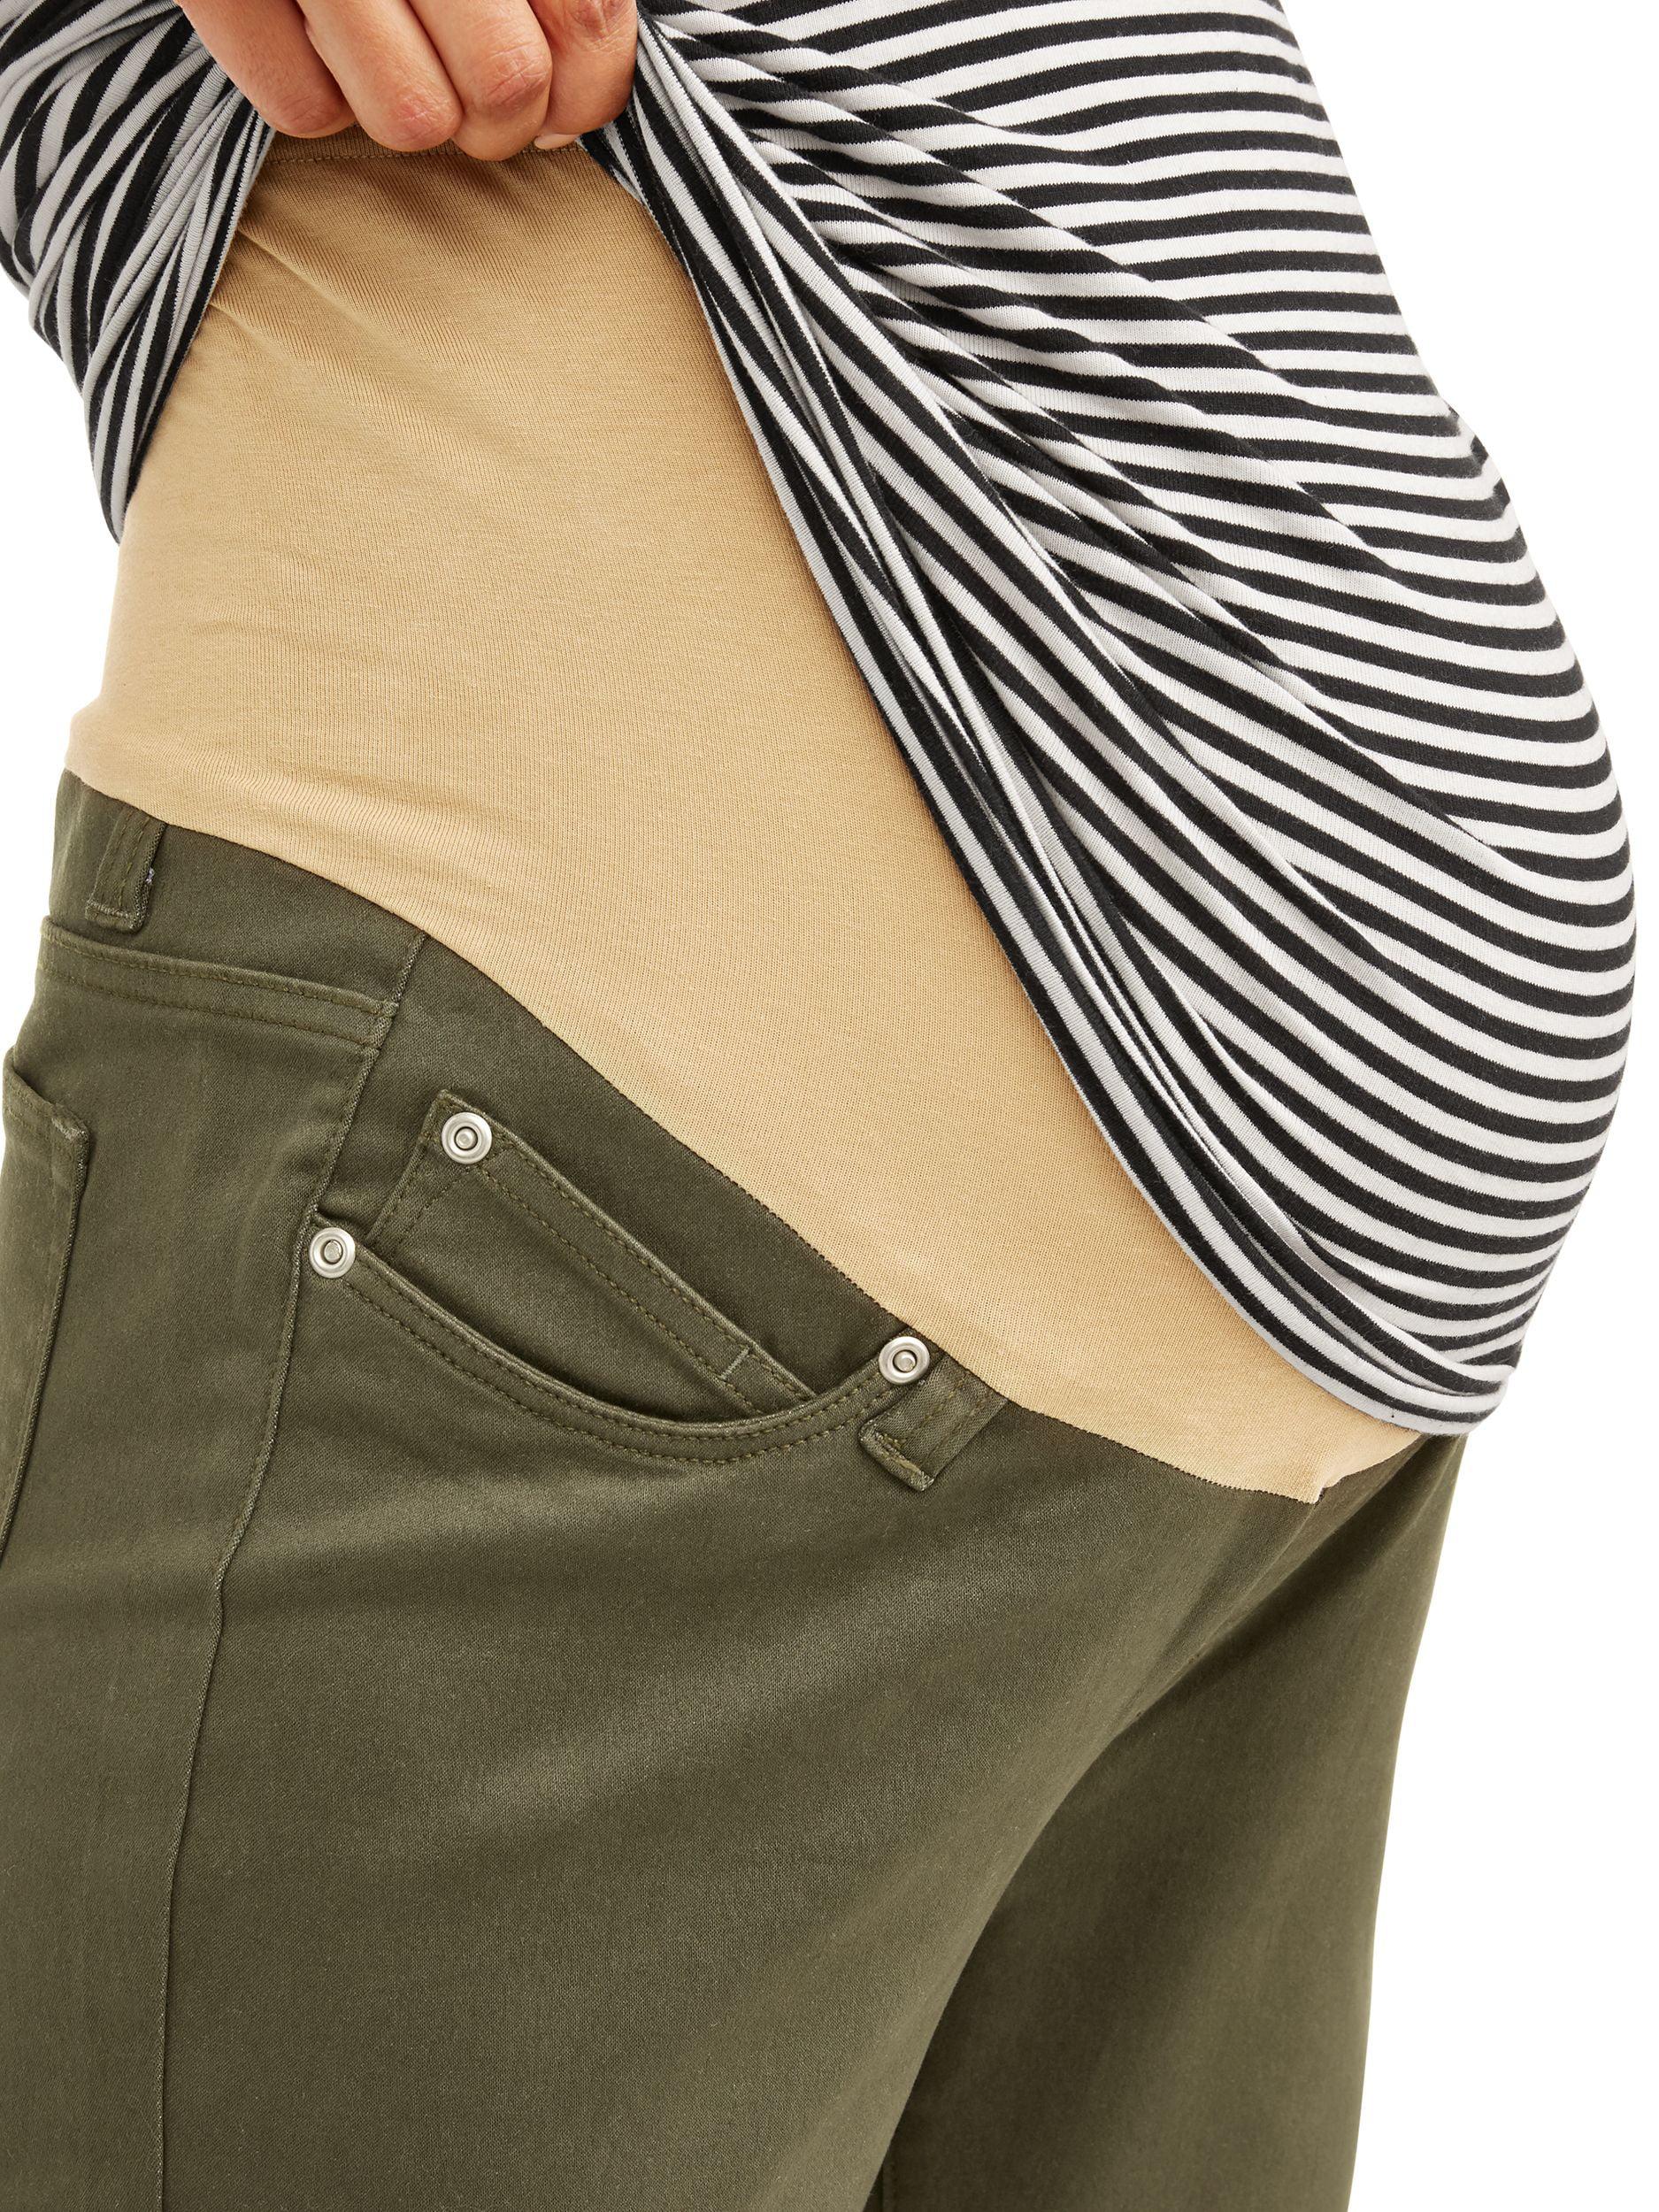 Ladies New Look Denim Under Bump Skinny Stretch Maternity Jegging Jeans Sze 8-18